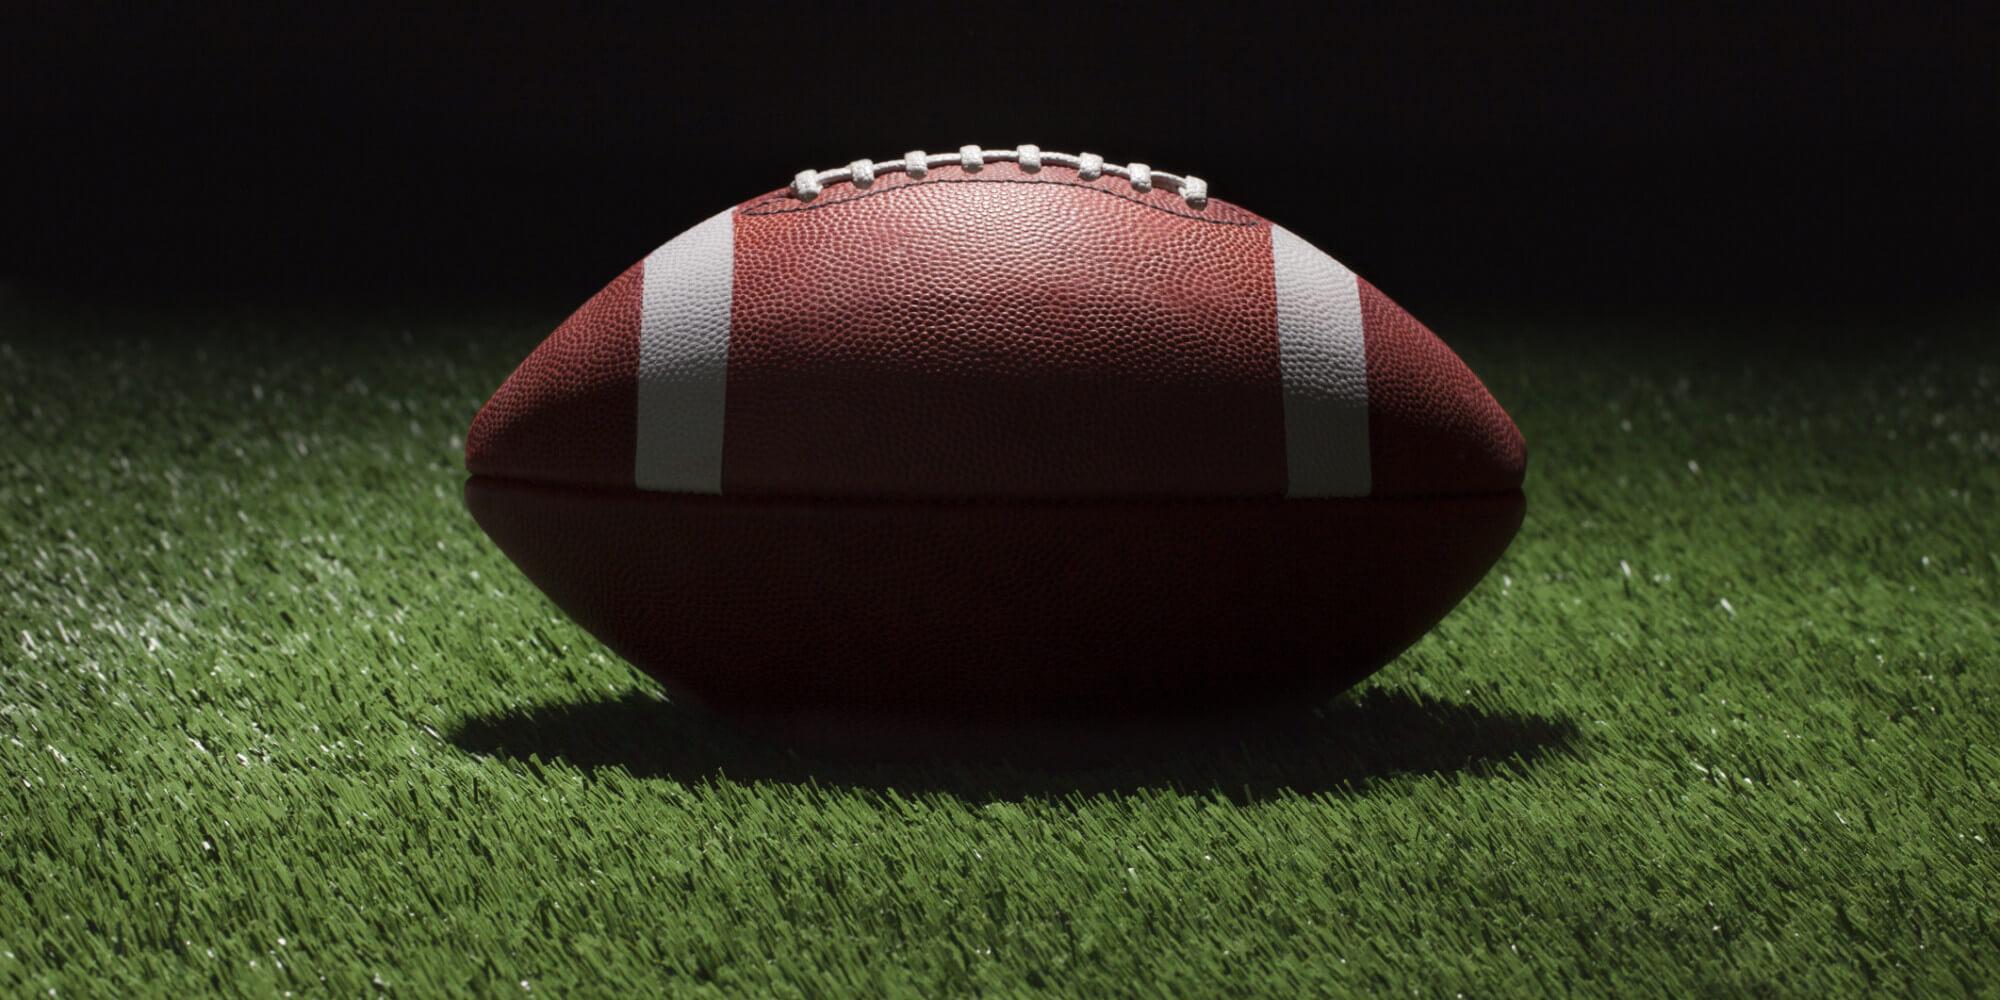 Raizner Slania Files Concussion Injury Lawsuit On Behalf of Syracuse Football Player